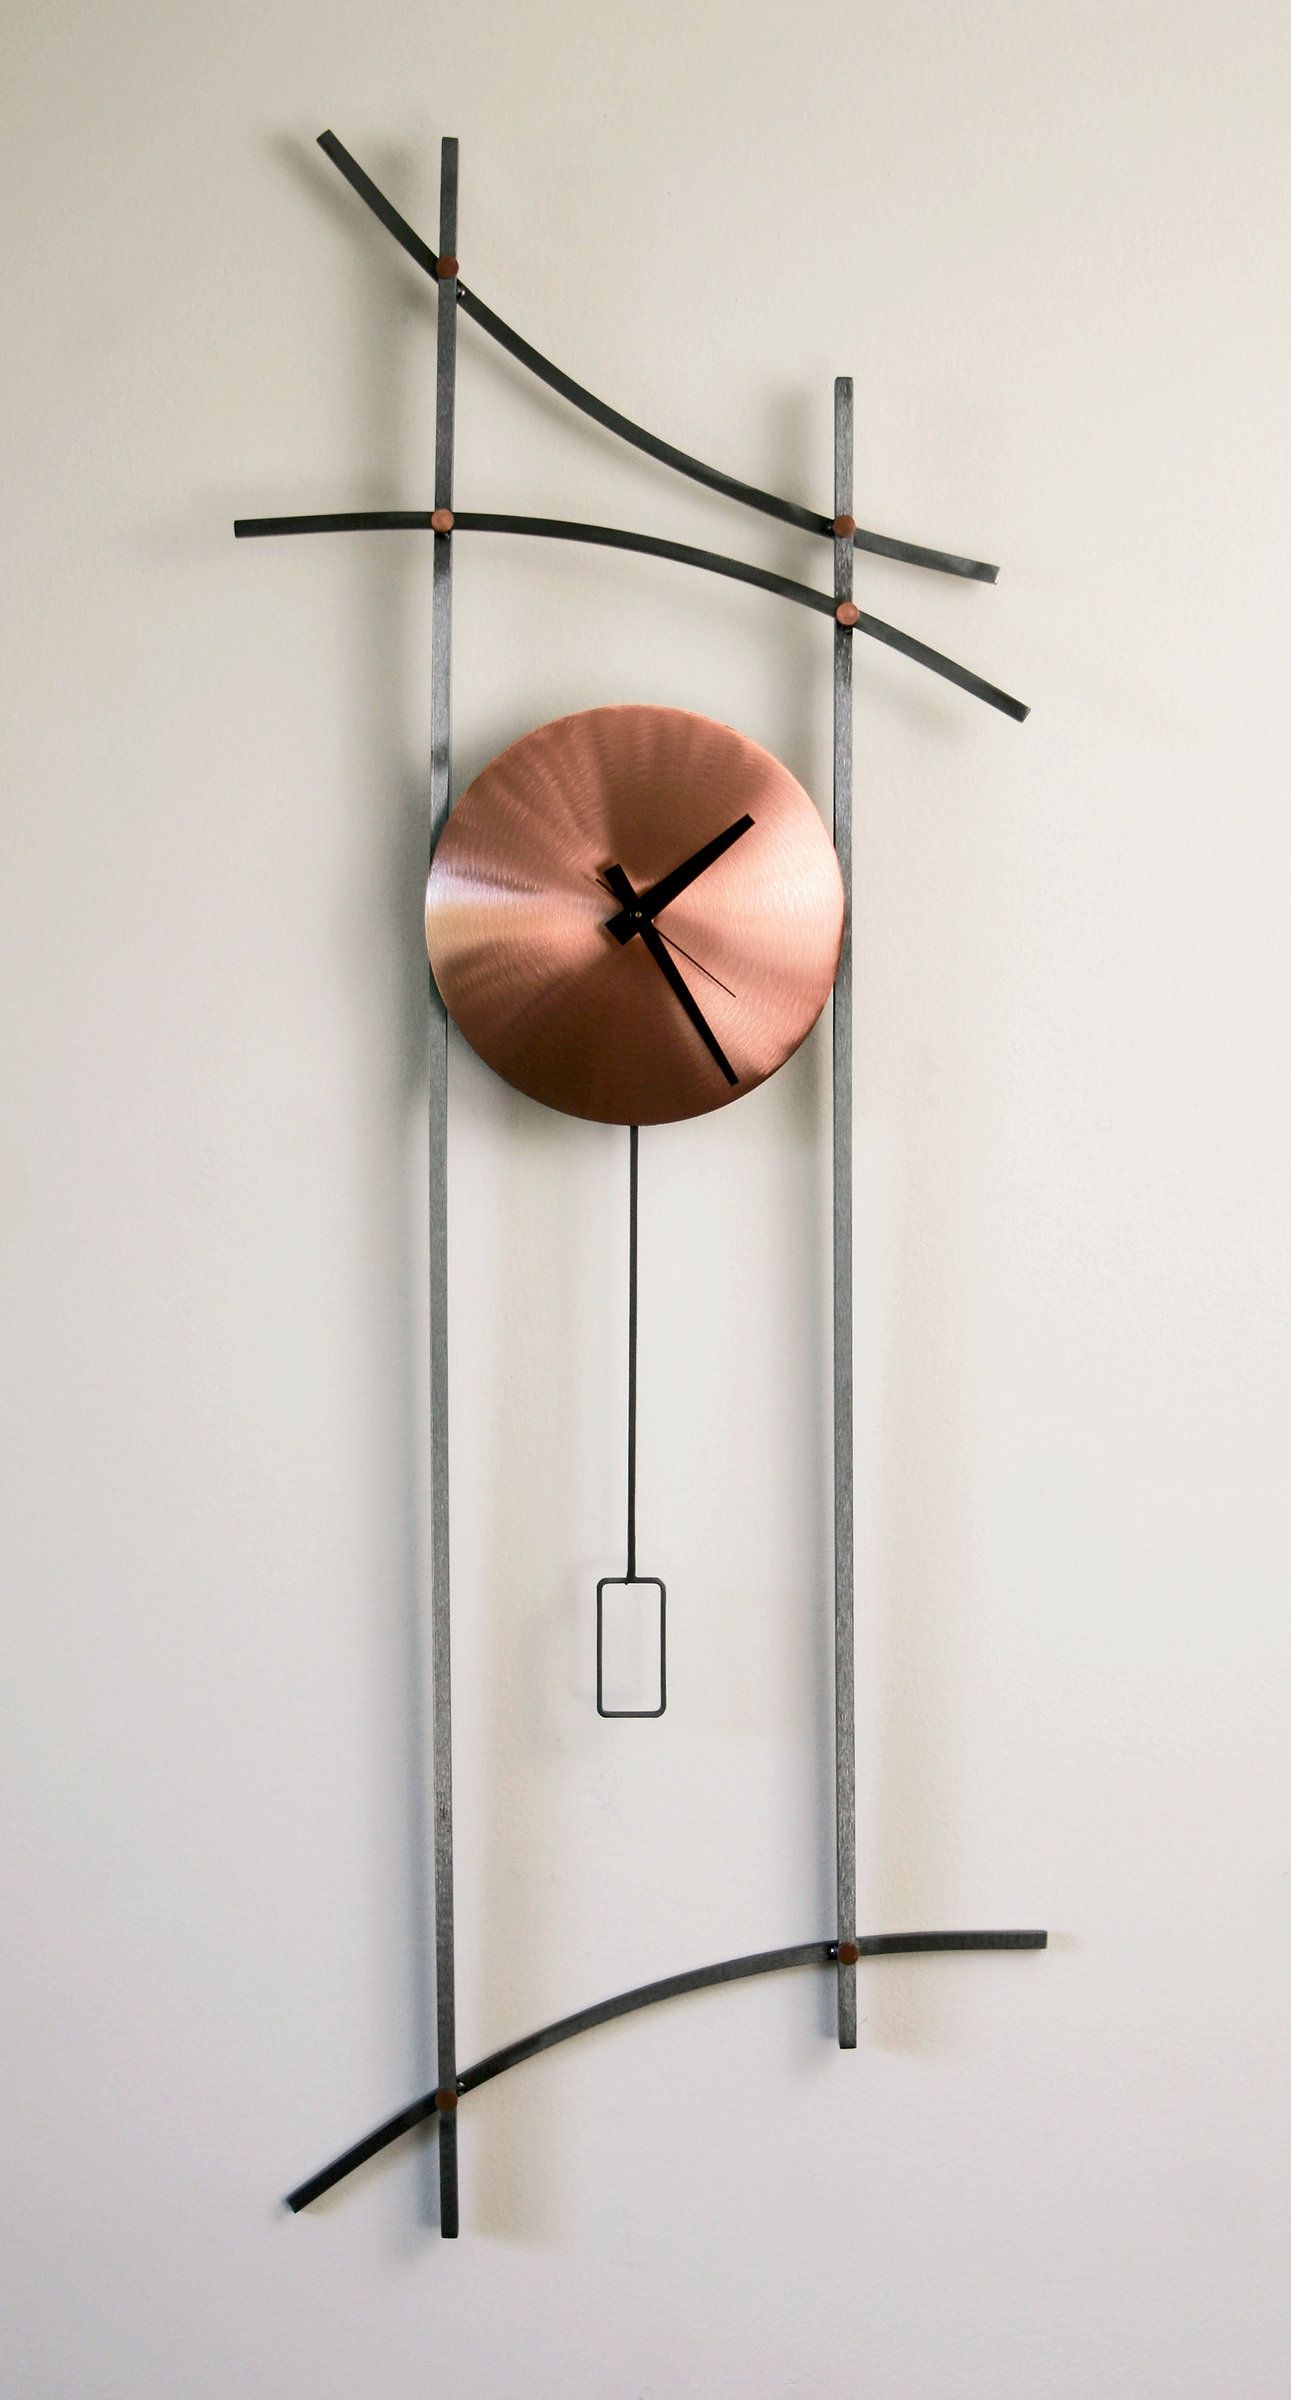 asian wall clock by ken girardini and julie girardini metal clock